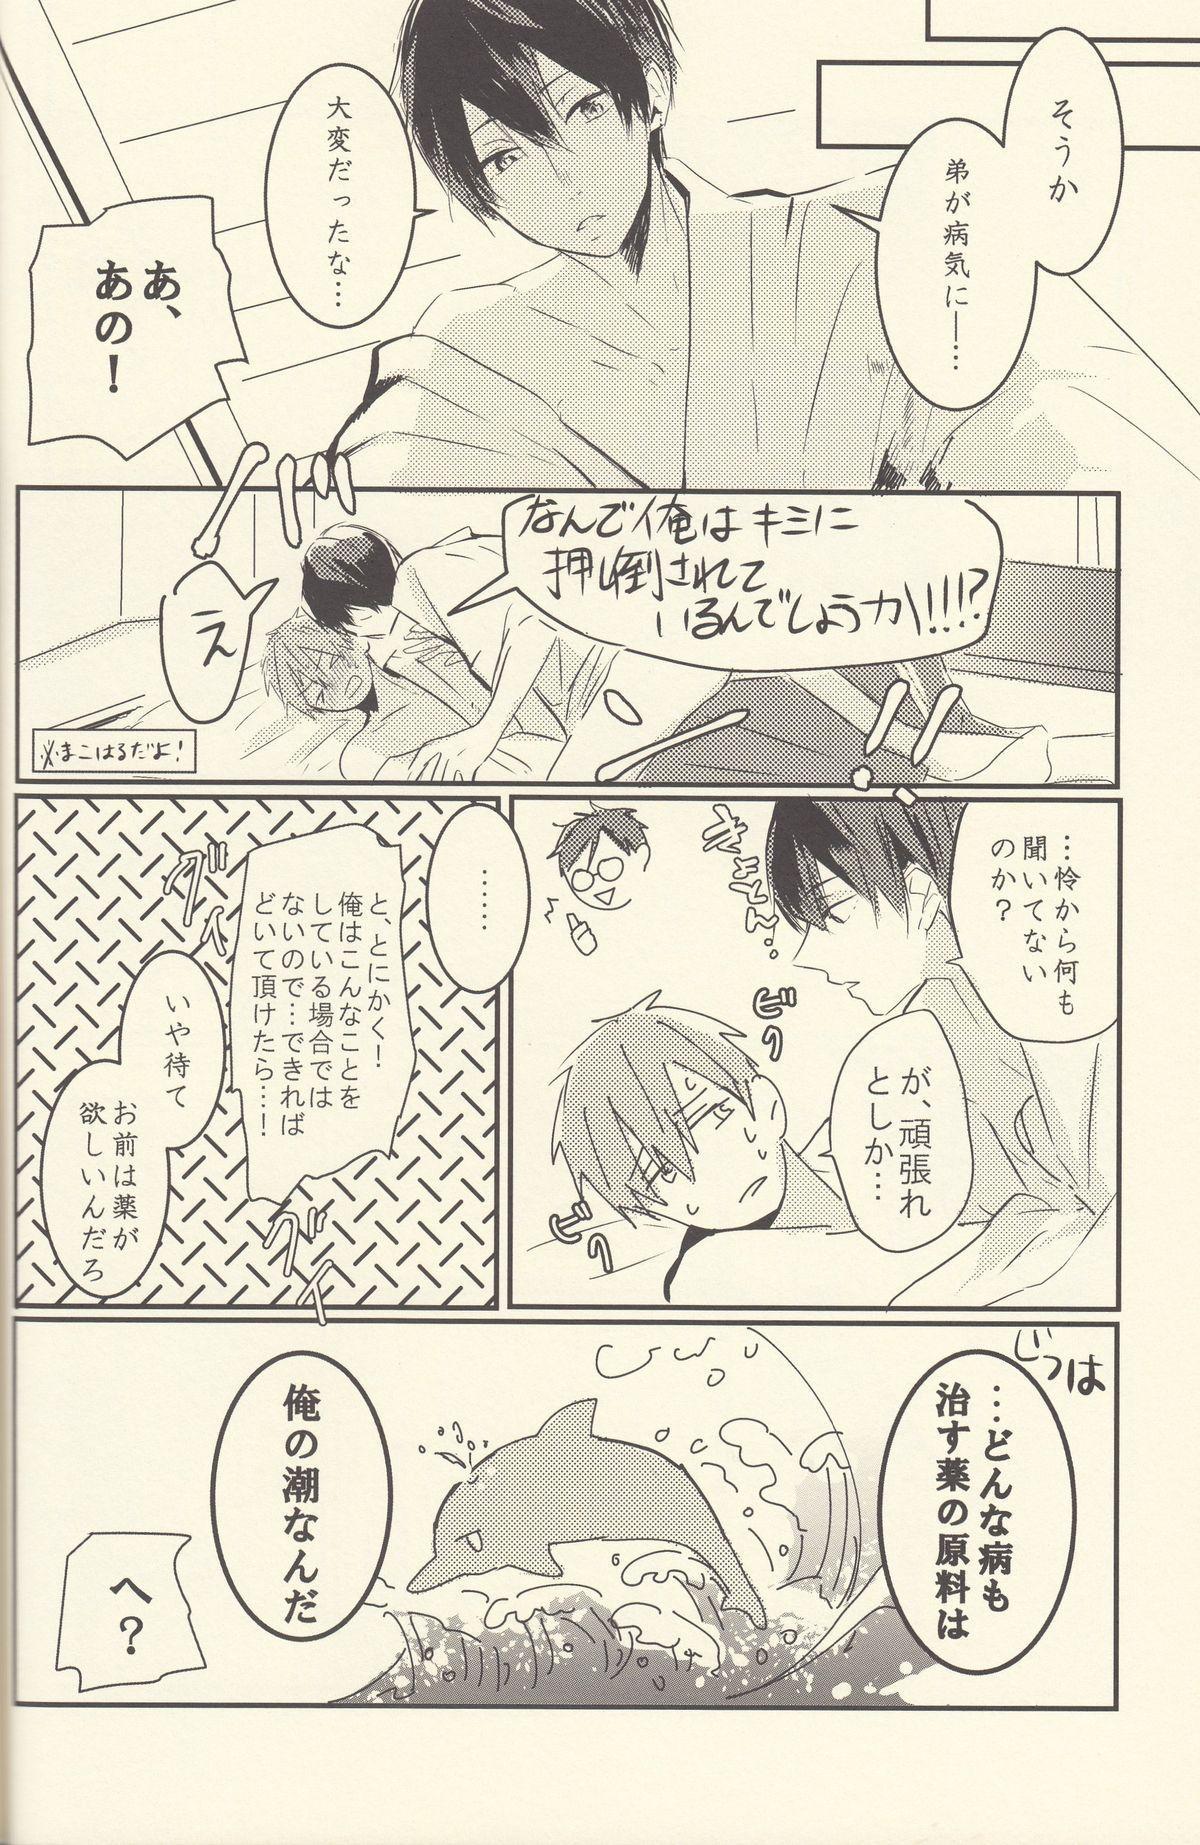 Shiofuki no Friendship - Makoto ♥ Haruka Squirting Anthology 19